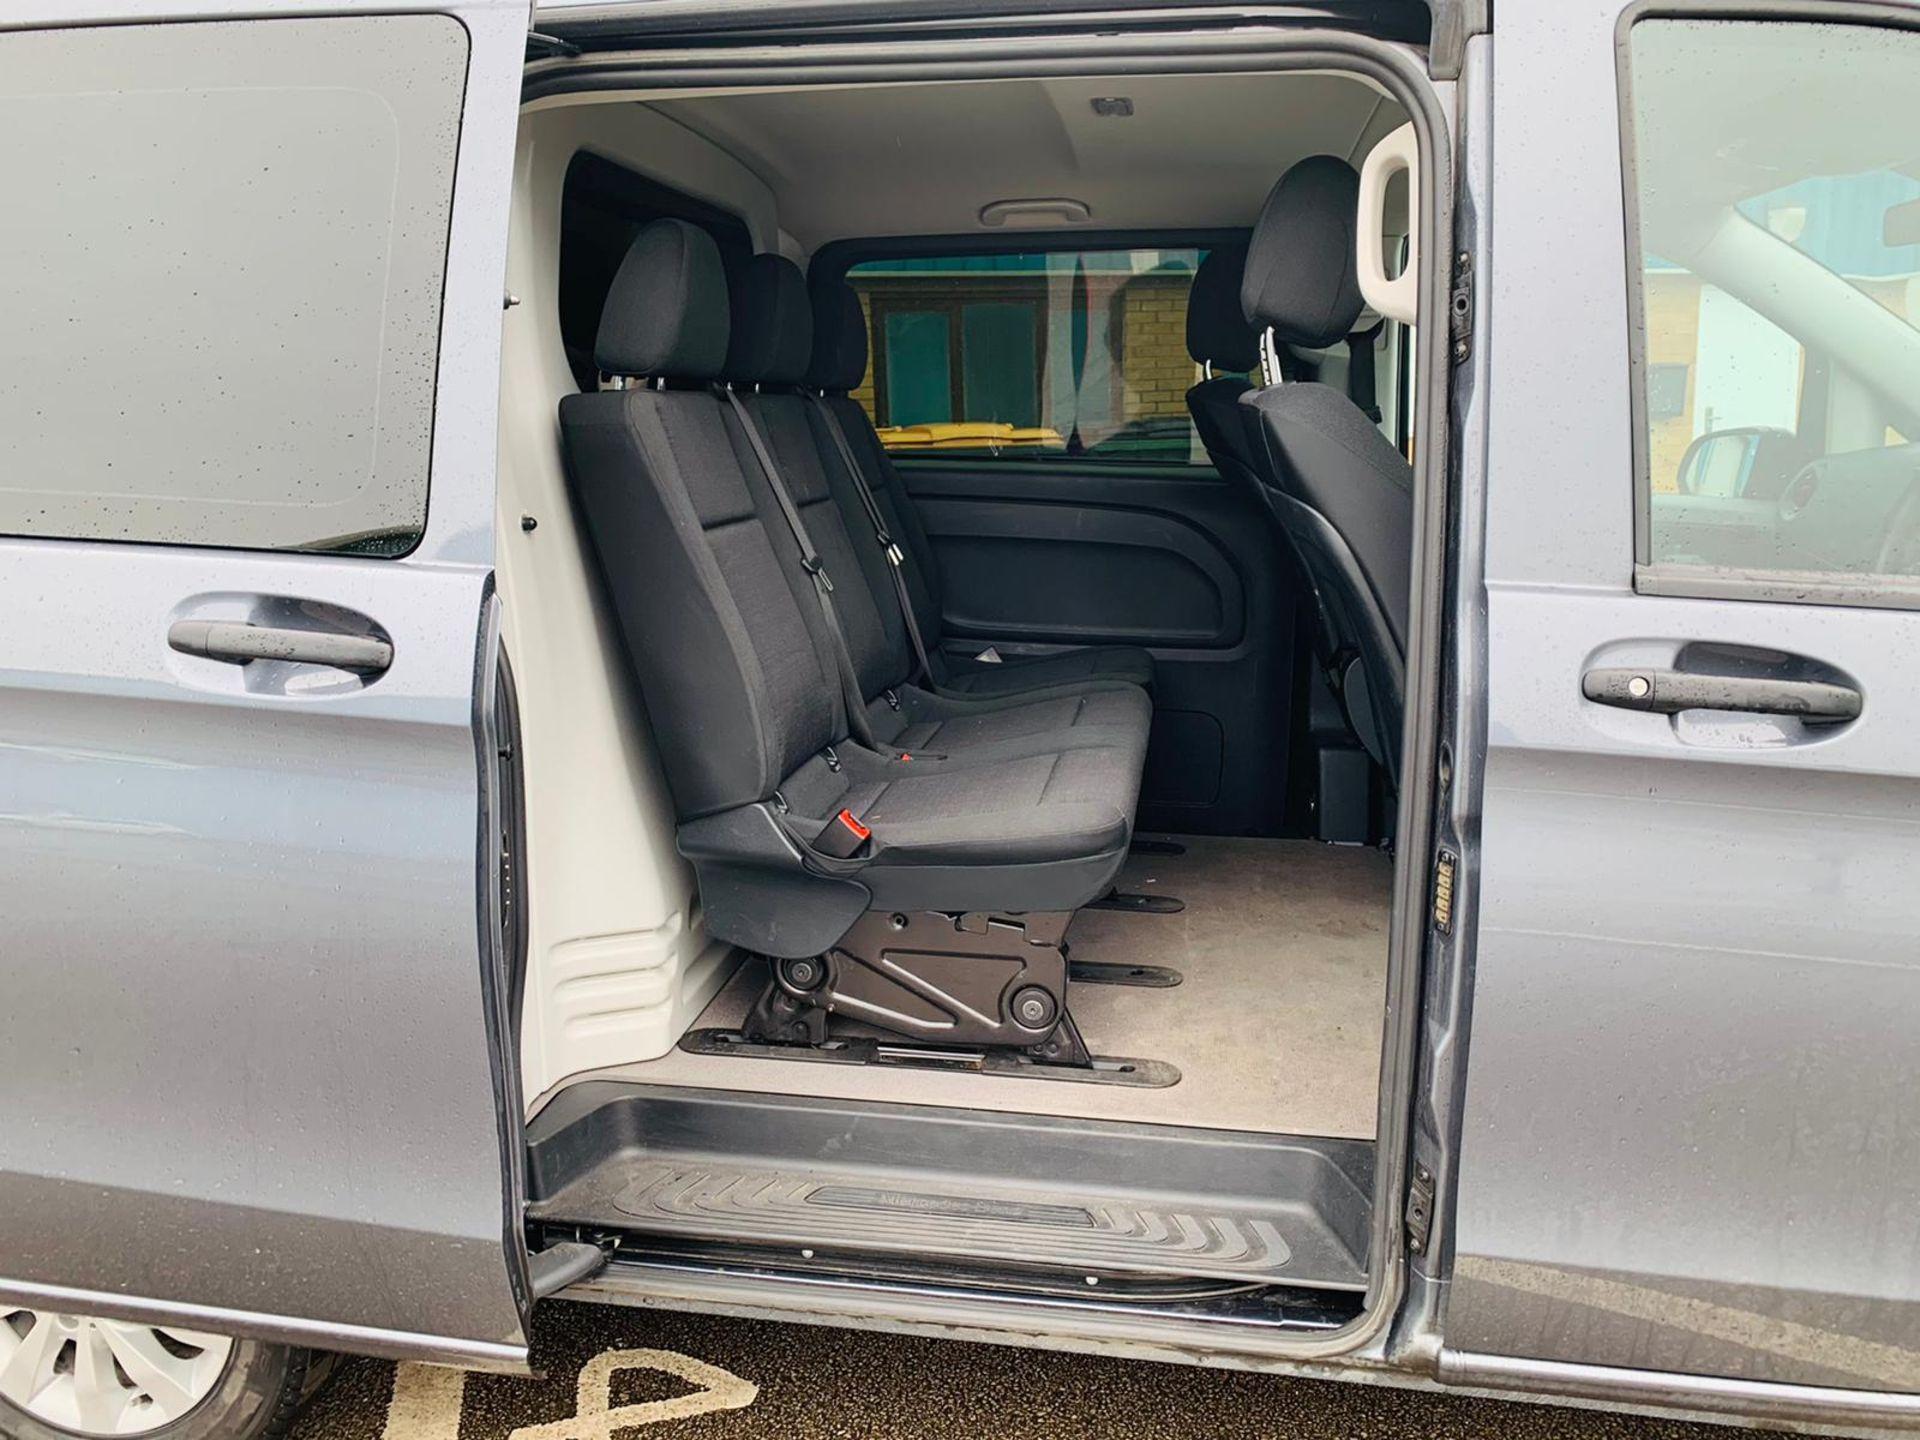 Mercedes Vito 114 Bluetec Dualiner/Crew Van - Auto - Air Con - 2018 18 Reg - 1 Owner From New - Image 10 of 25